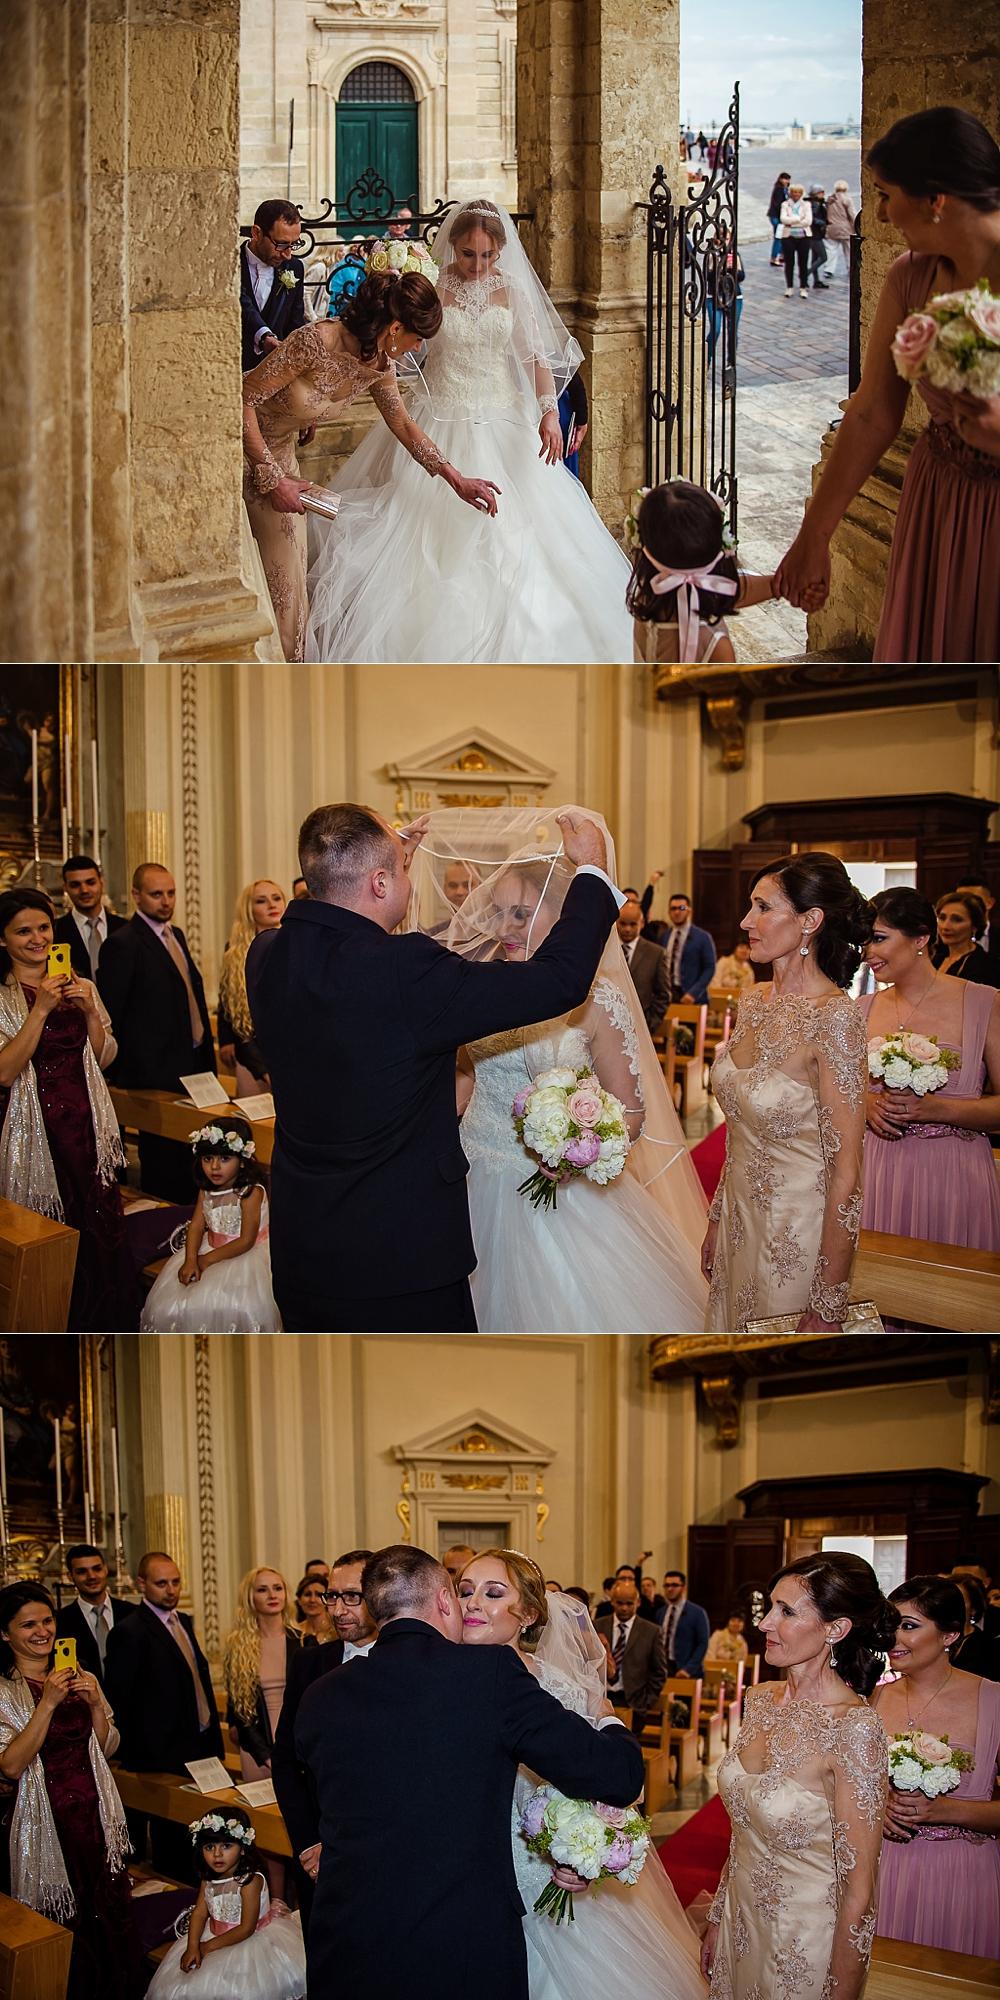 Valentina & Dimitri - Villa Bologna - Wedding Photography Malta - Shane P. Watts Photography